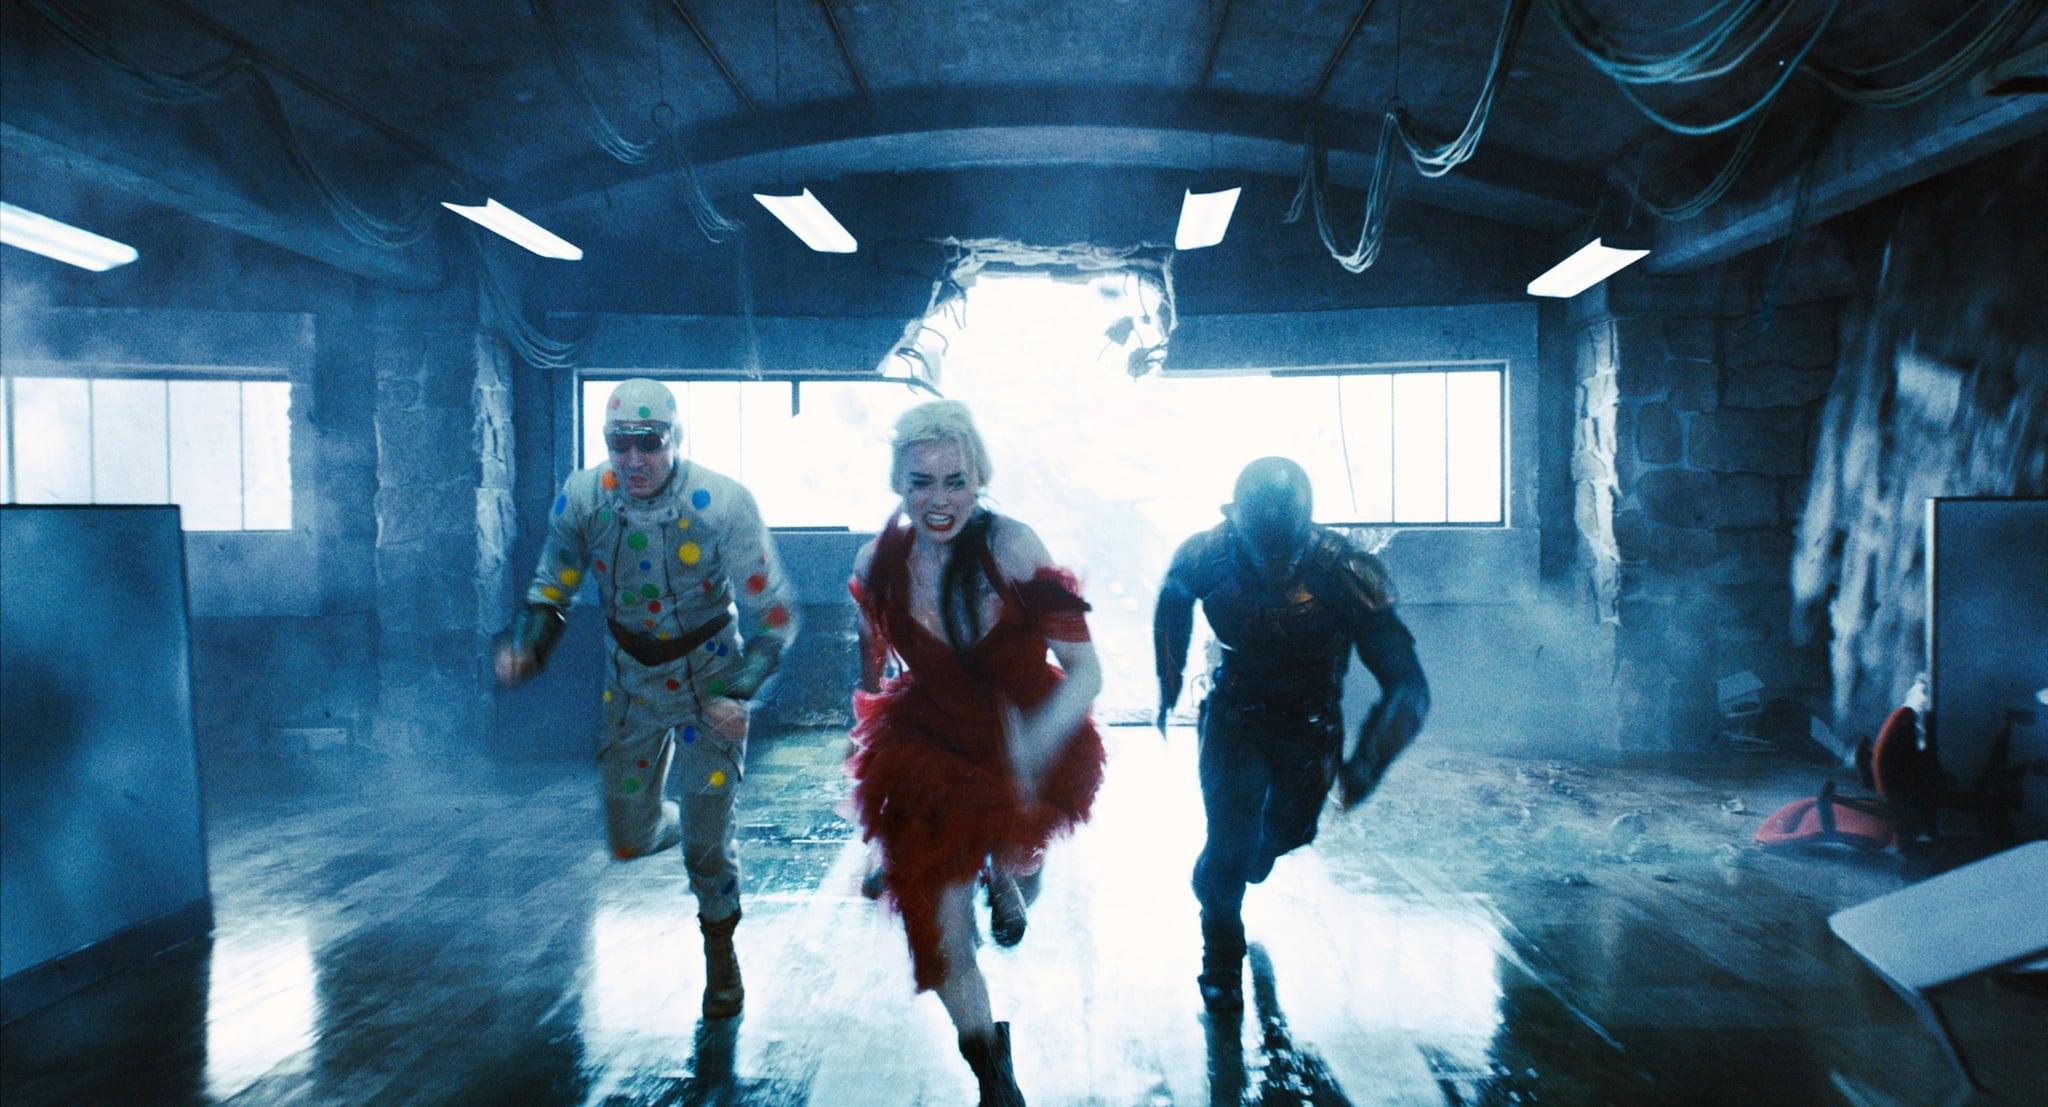 THE SUICIDE SQUAD, from left: David Dastmalchian as Polka-Dot Man, Margot Robbie as Harley Quinn, Idris Elba as Bloodsport, 2021.  Warner Bros. /Courtesy Everett Collection